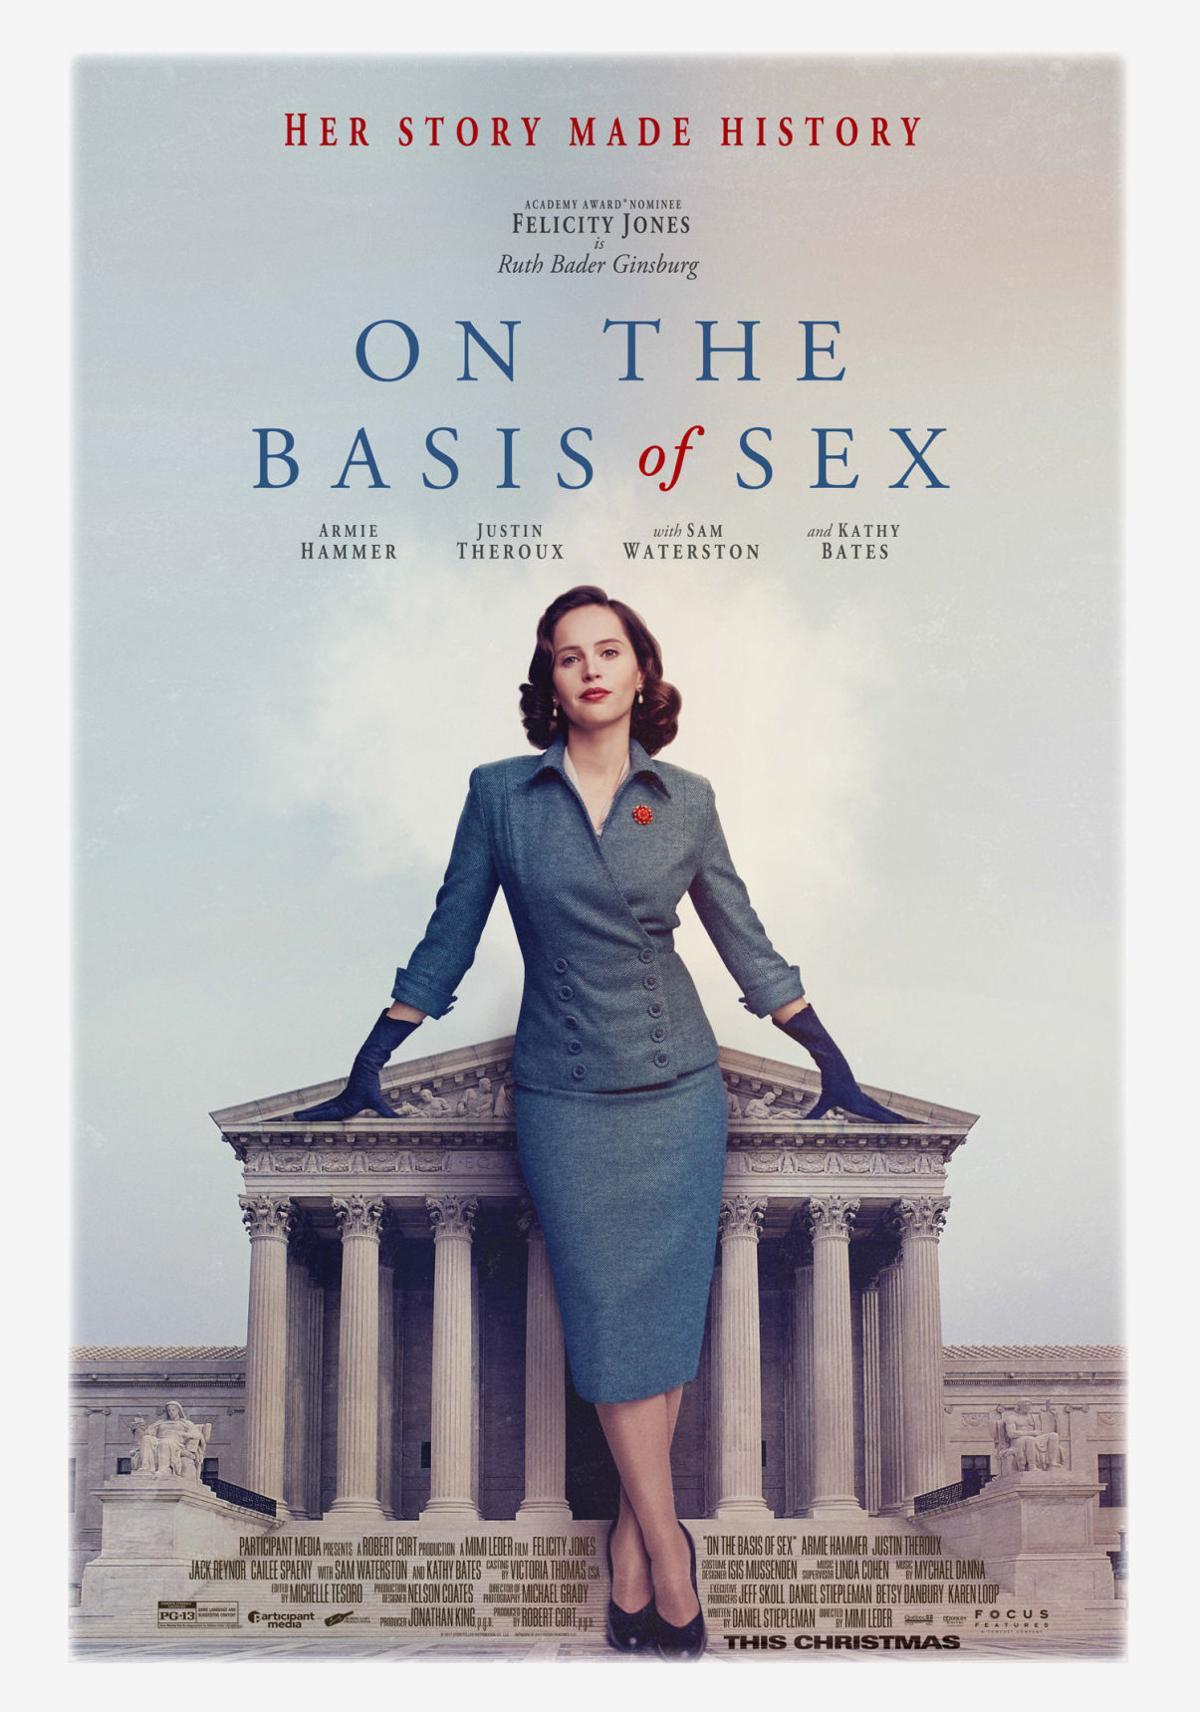 basis of sex